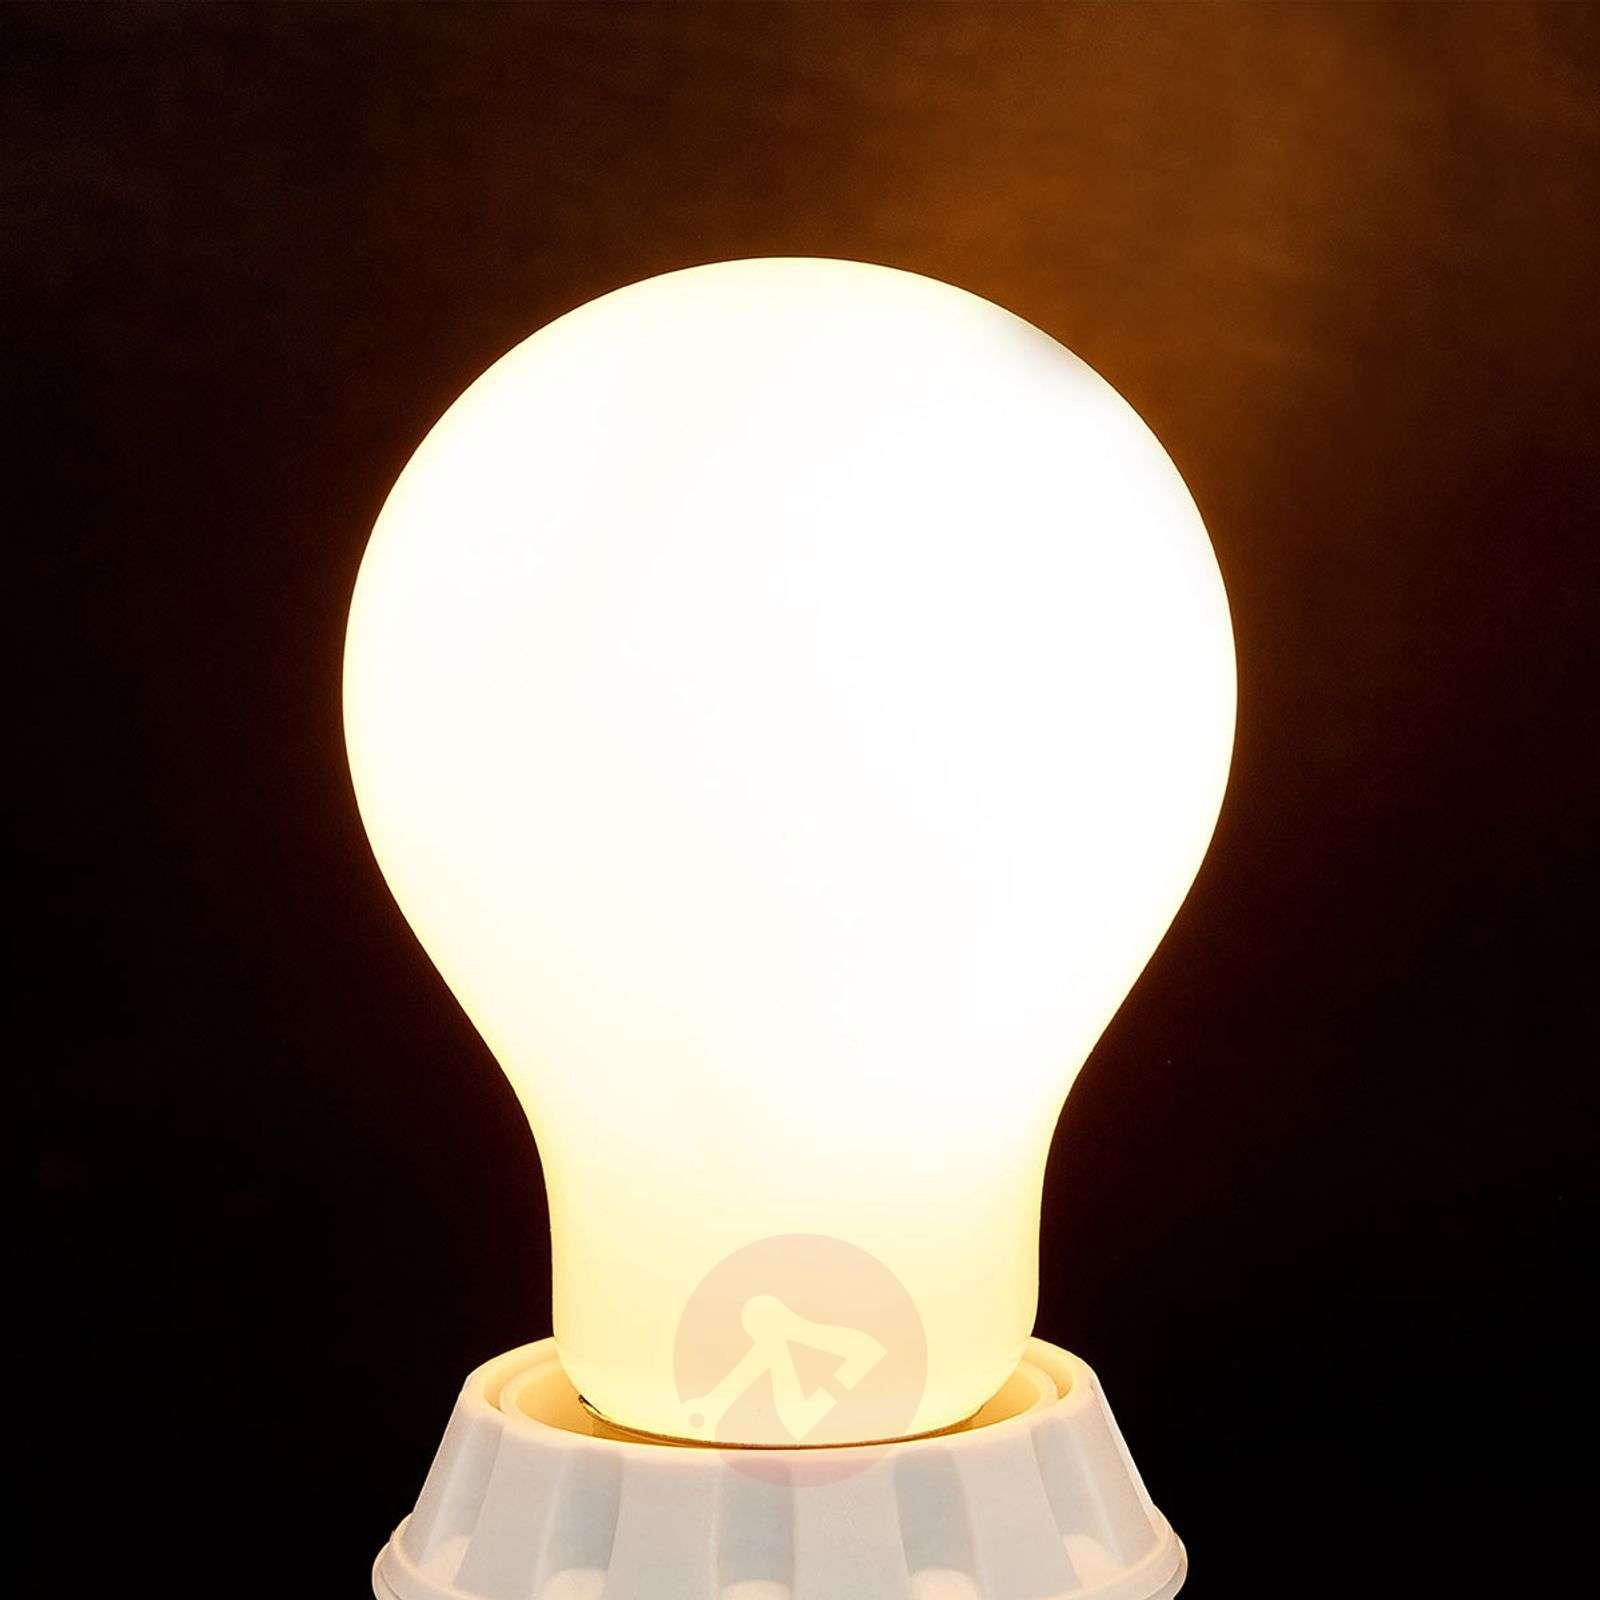 E27-LED-filamenttilamppu 7 W 806 lm 2700 K opaali-9993037-01